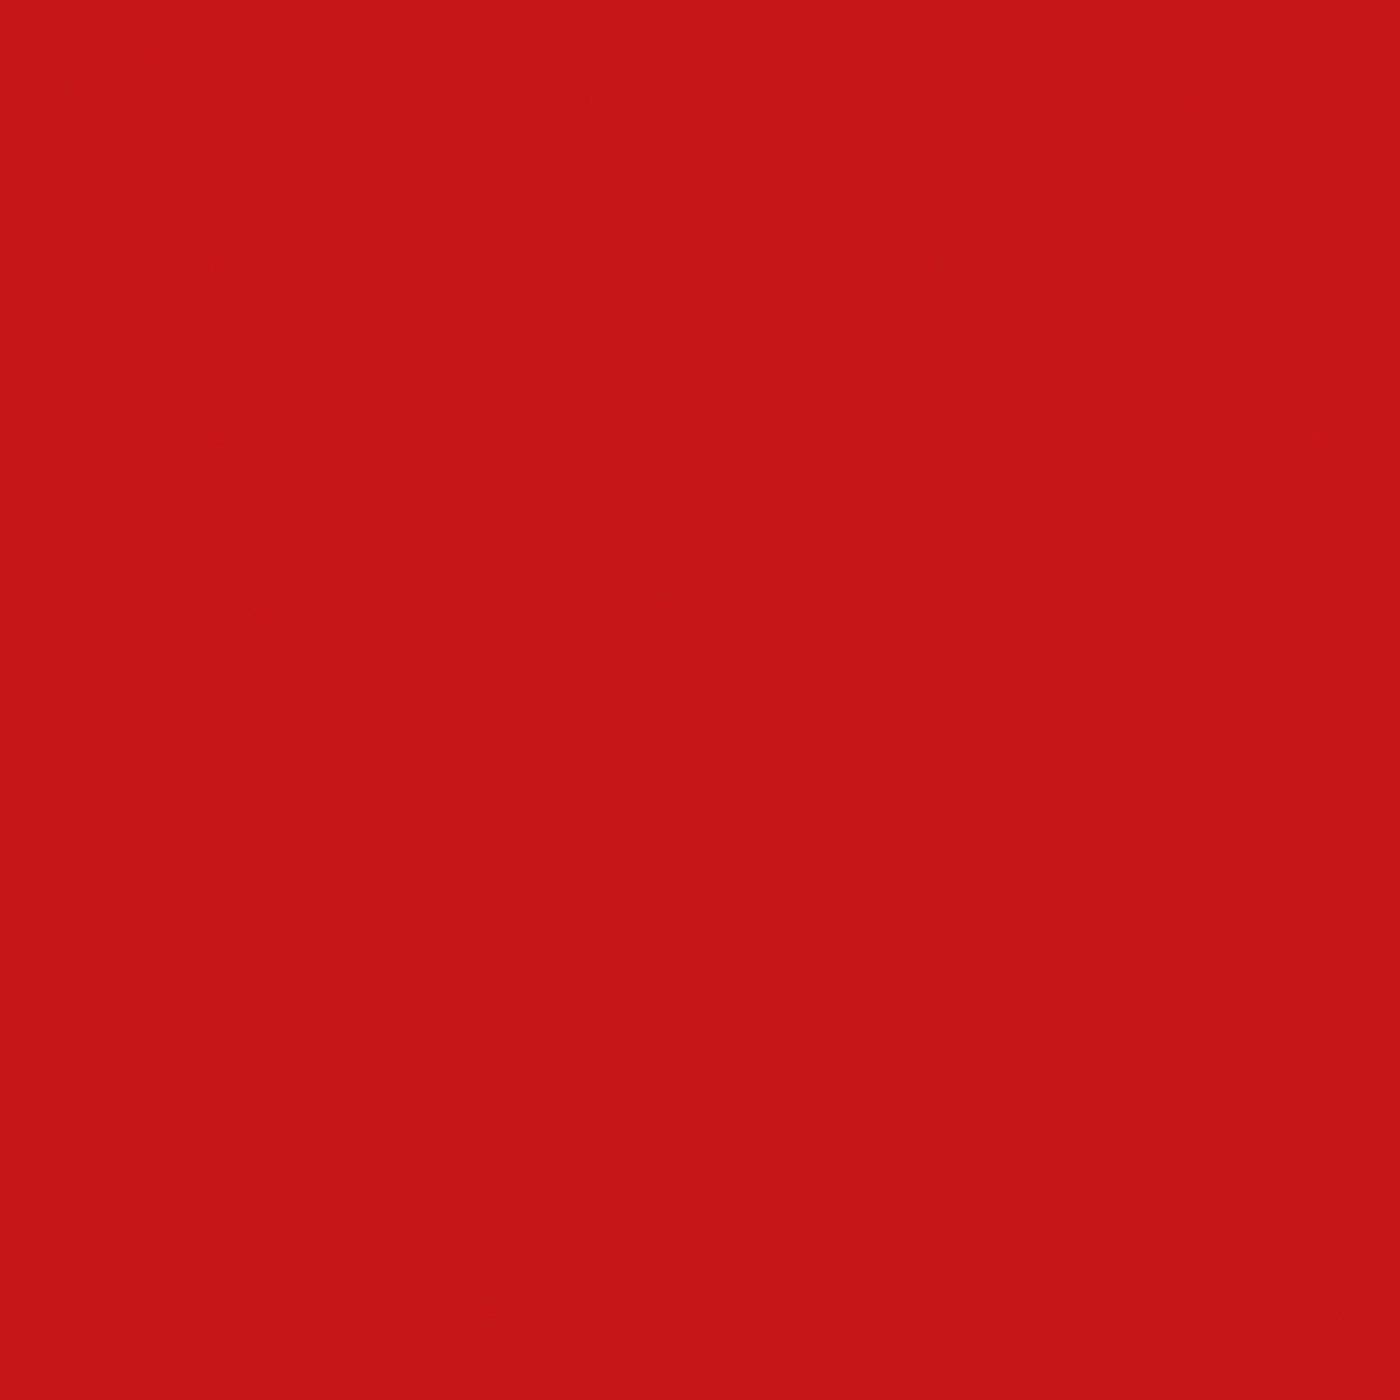 Tecido TNT 80 100% Polipropileno 1,40 Mt Largura Vermelho